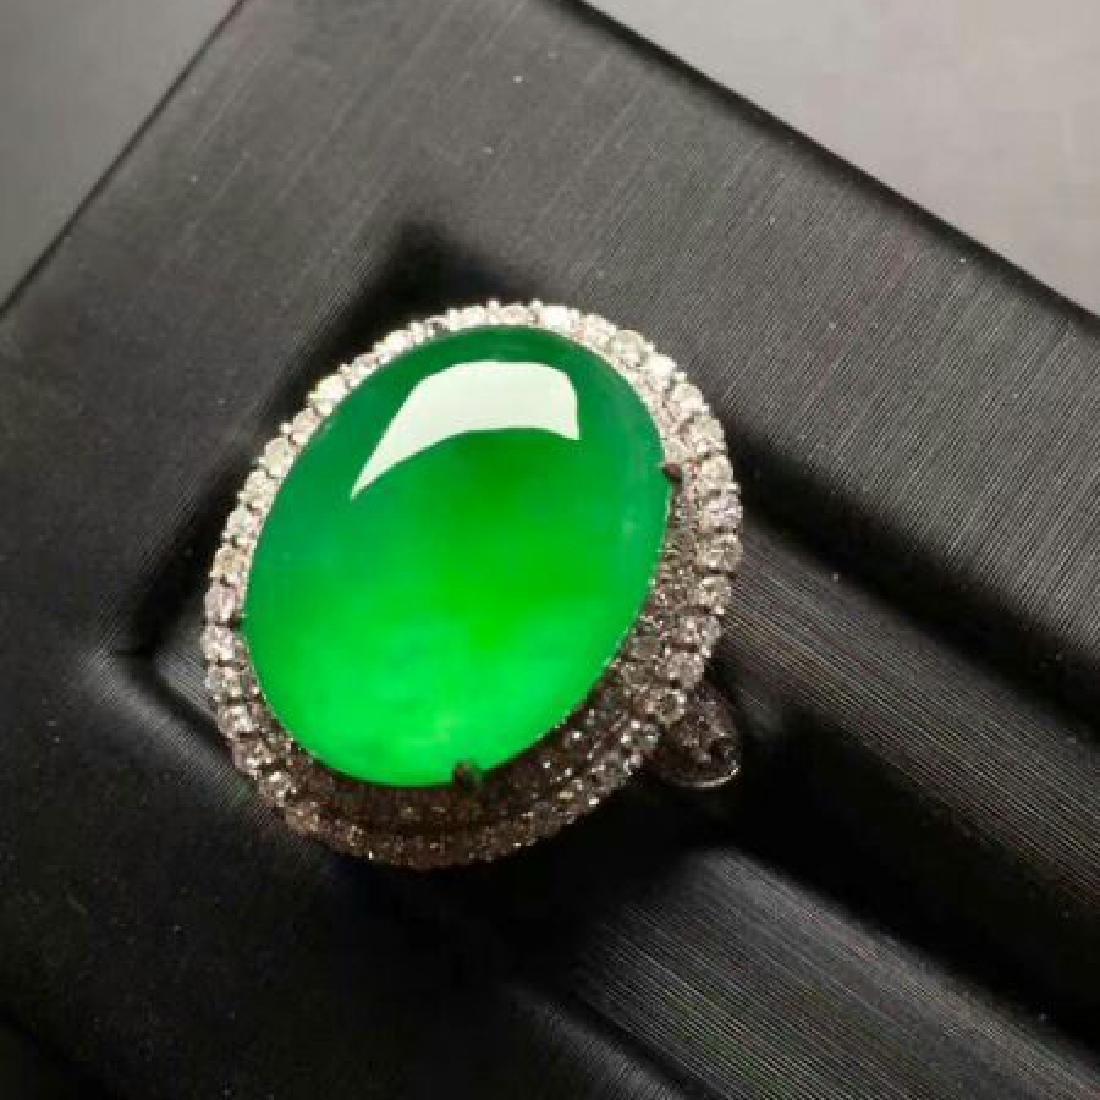 Chinese Jadeite 18K Gold Ring